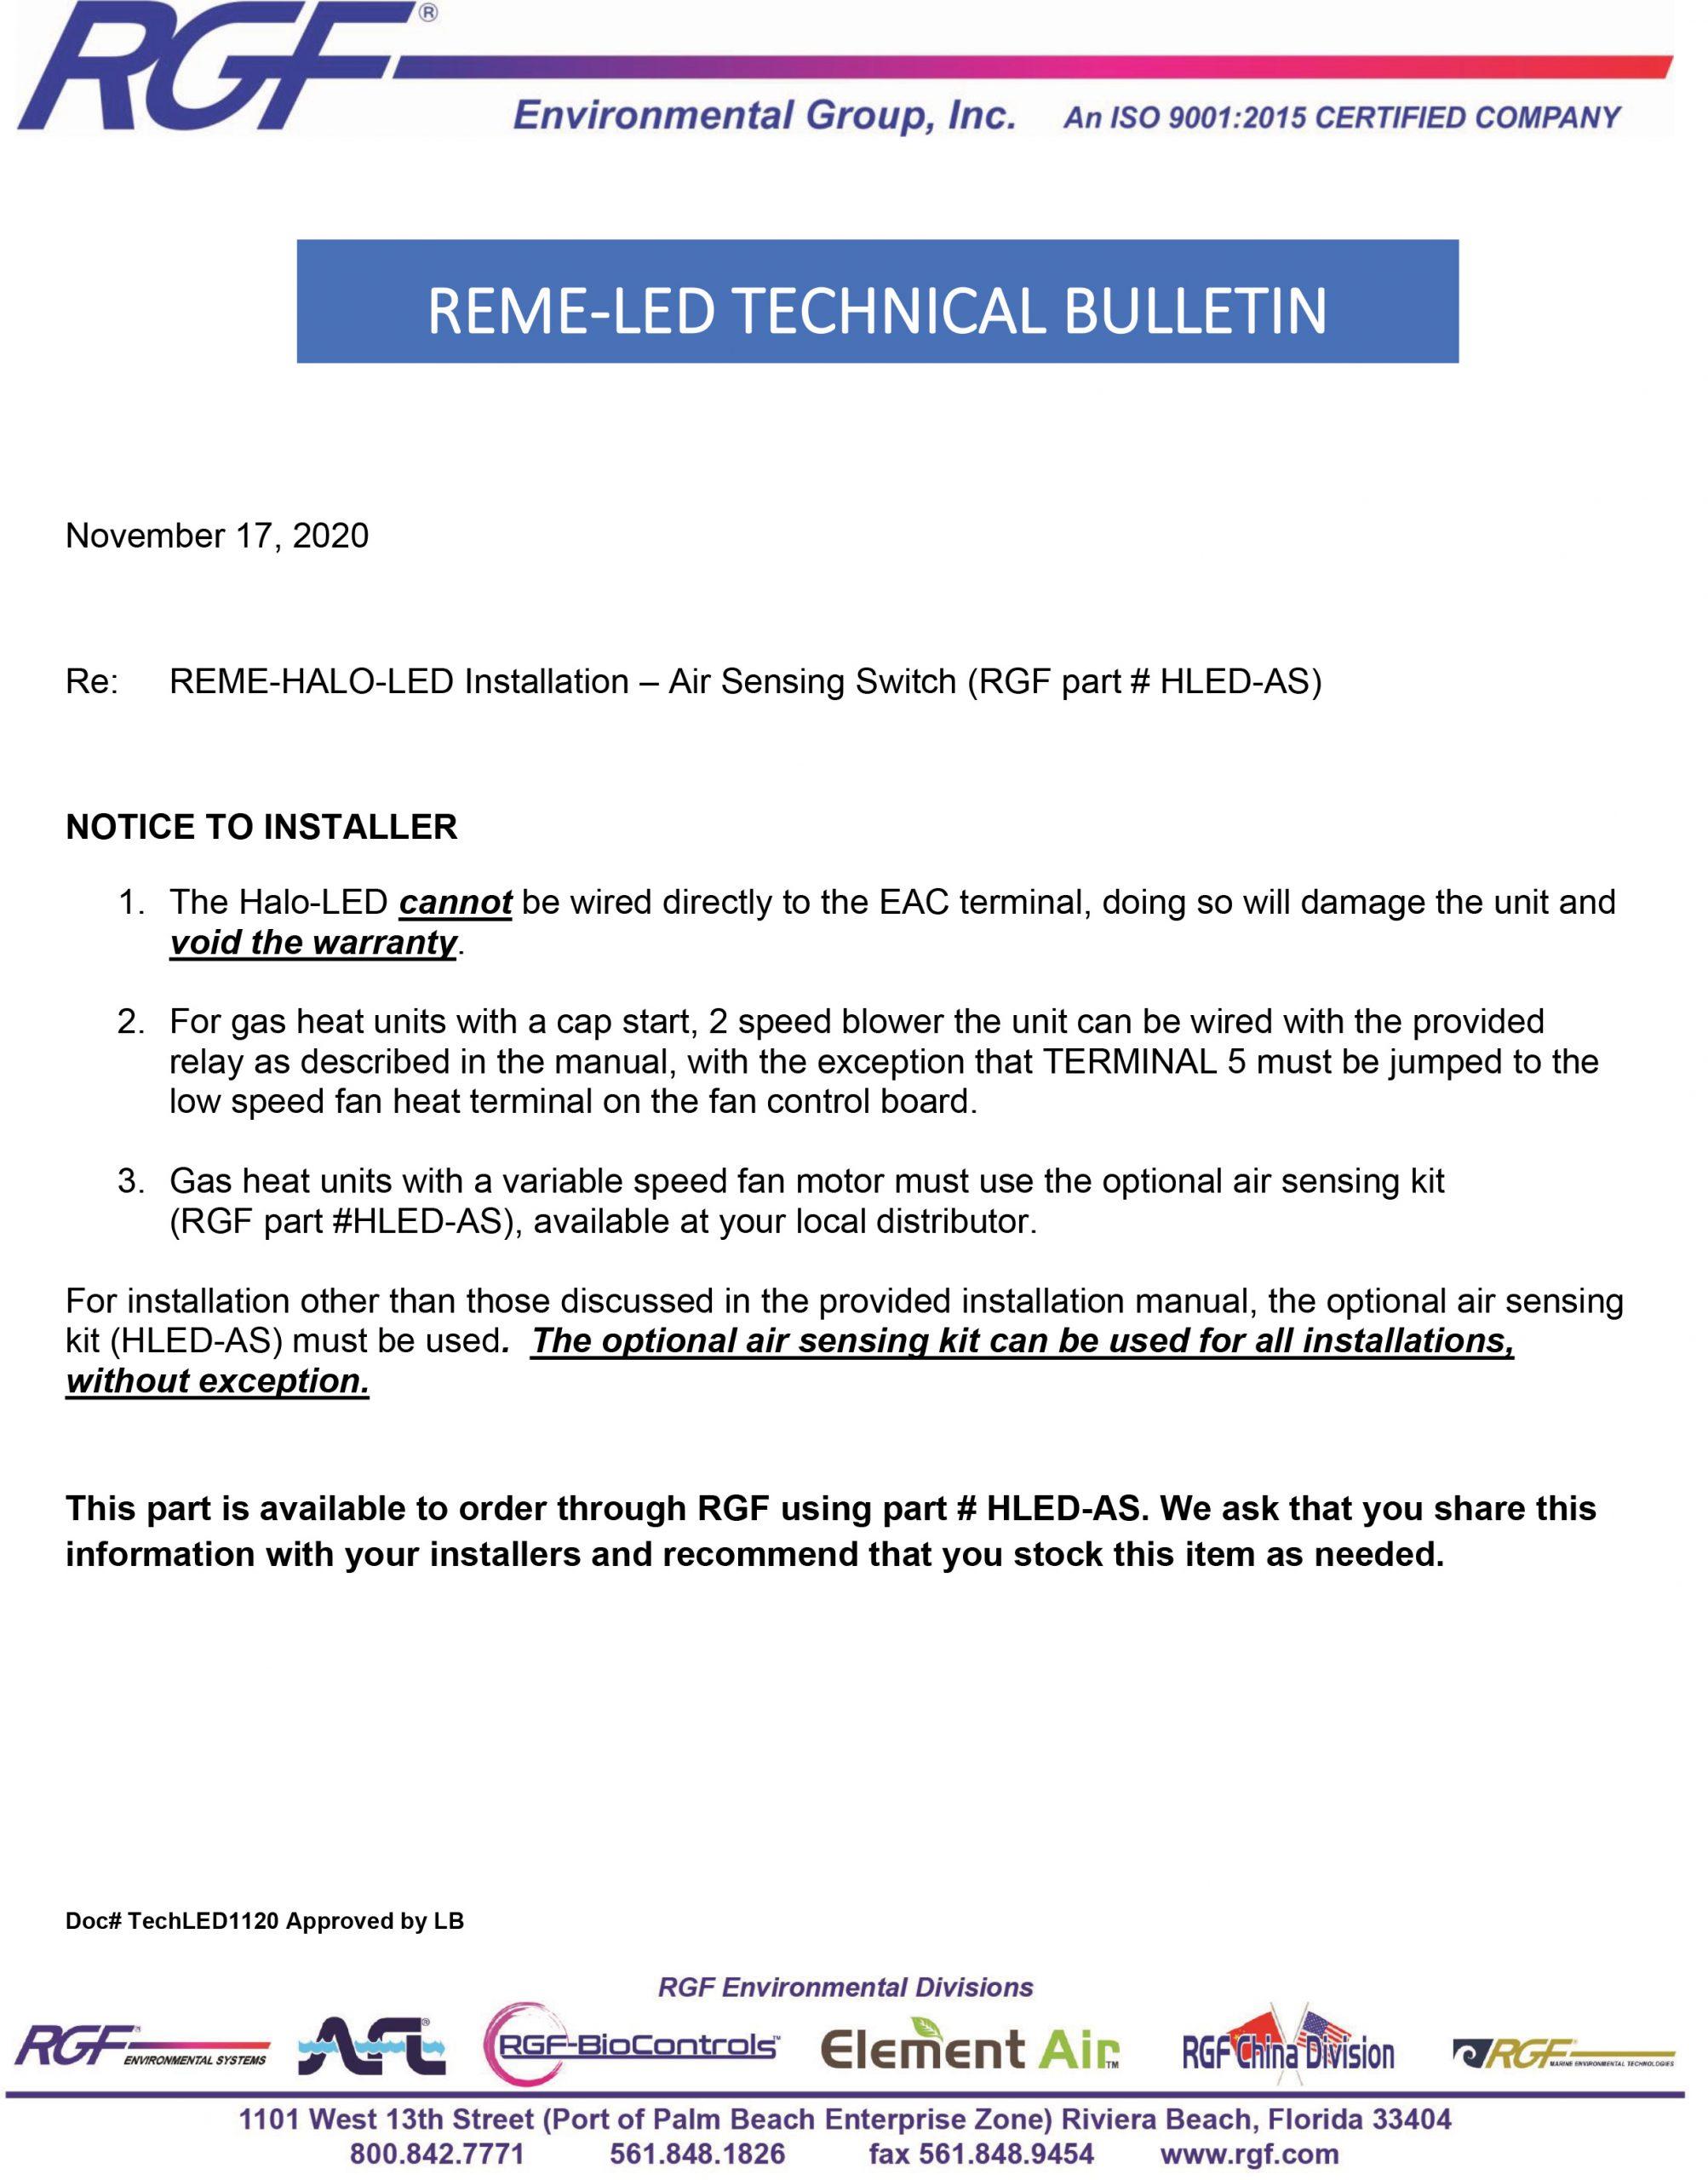 REME LED Technical bulletin